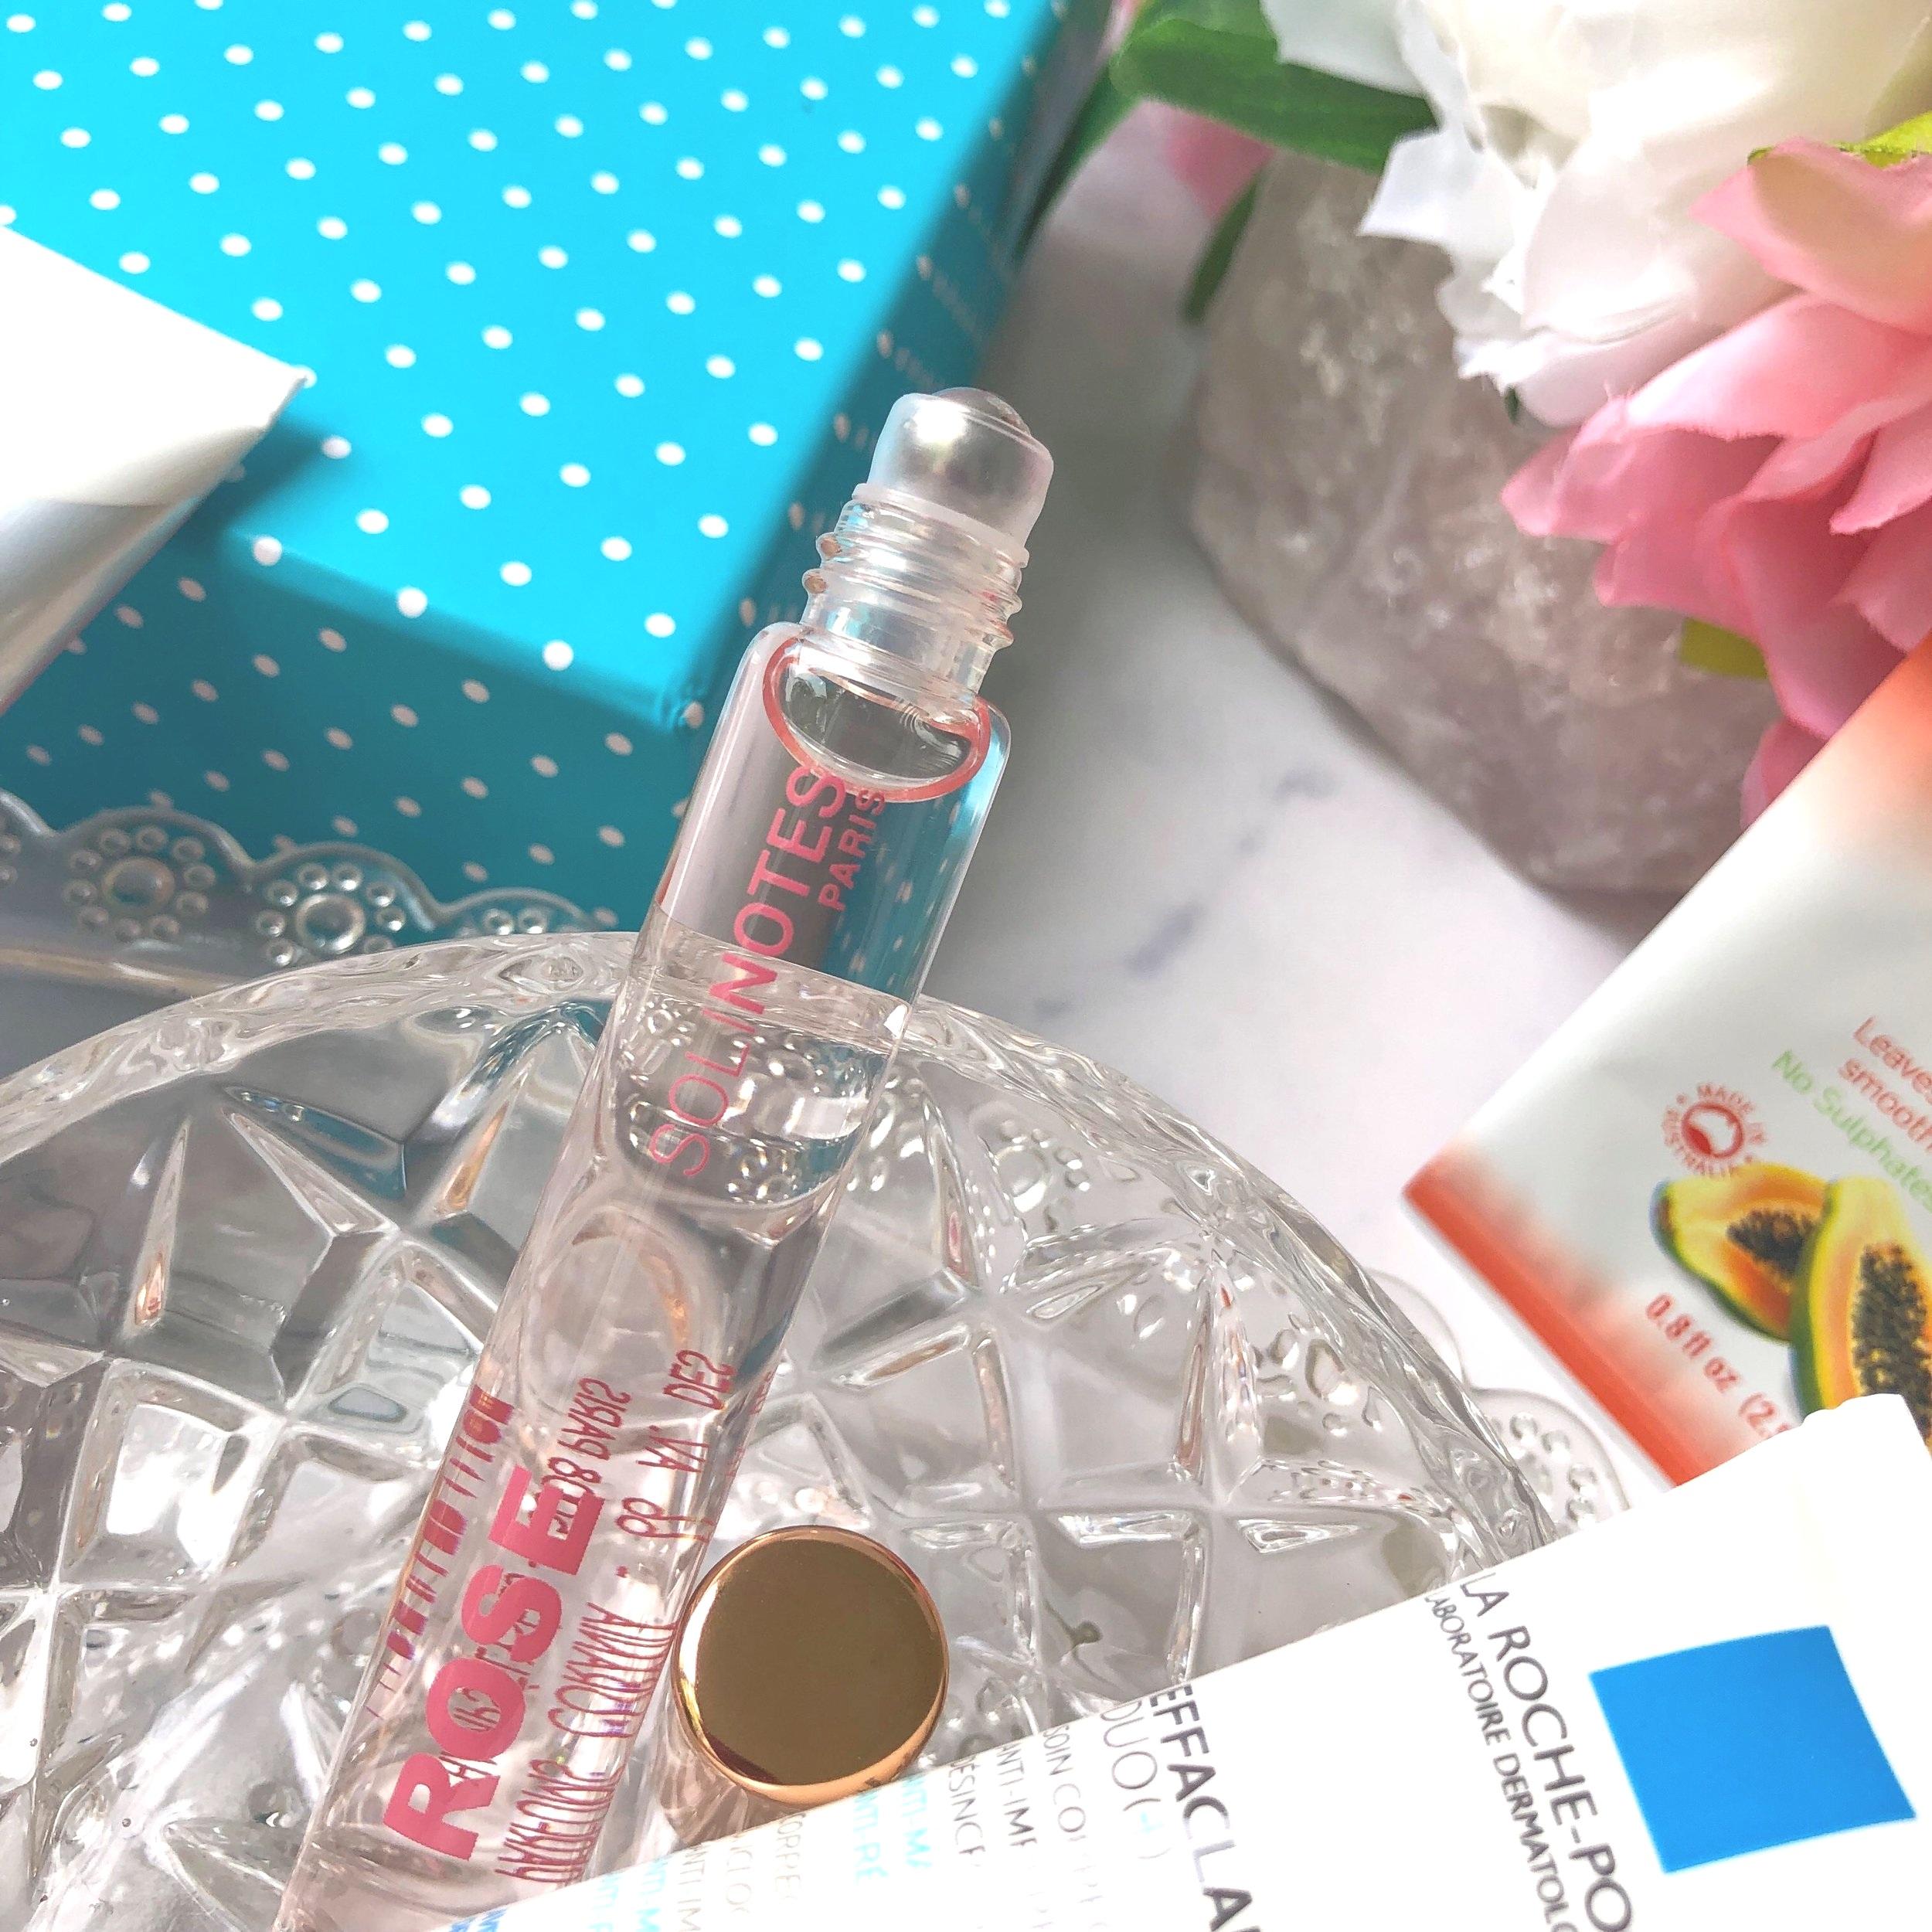 solinotes+rose+perfume.jpg